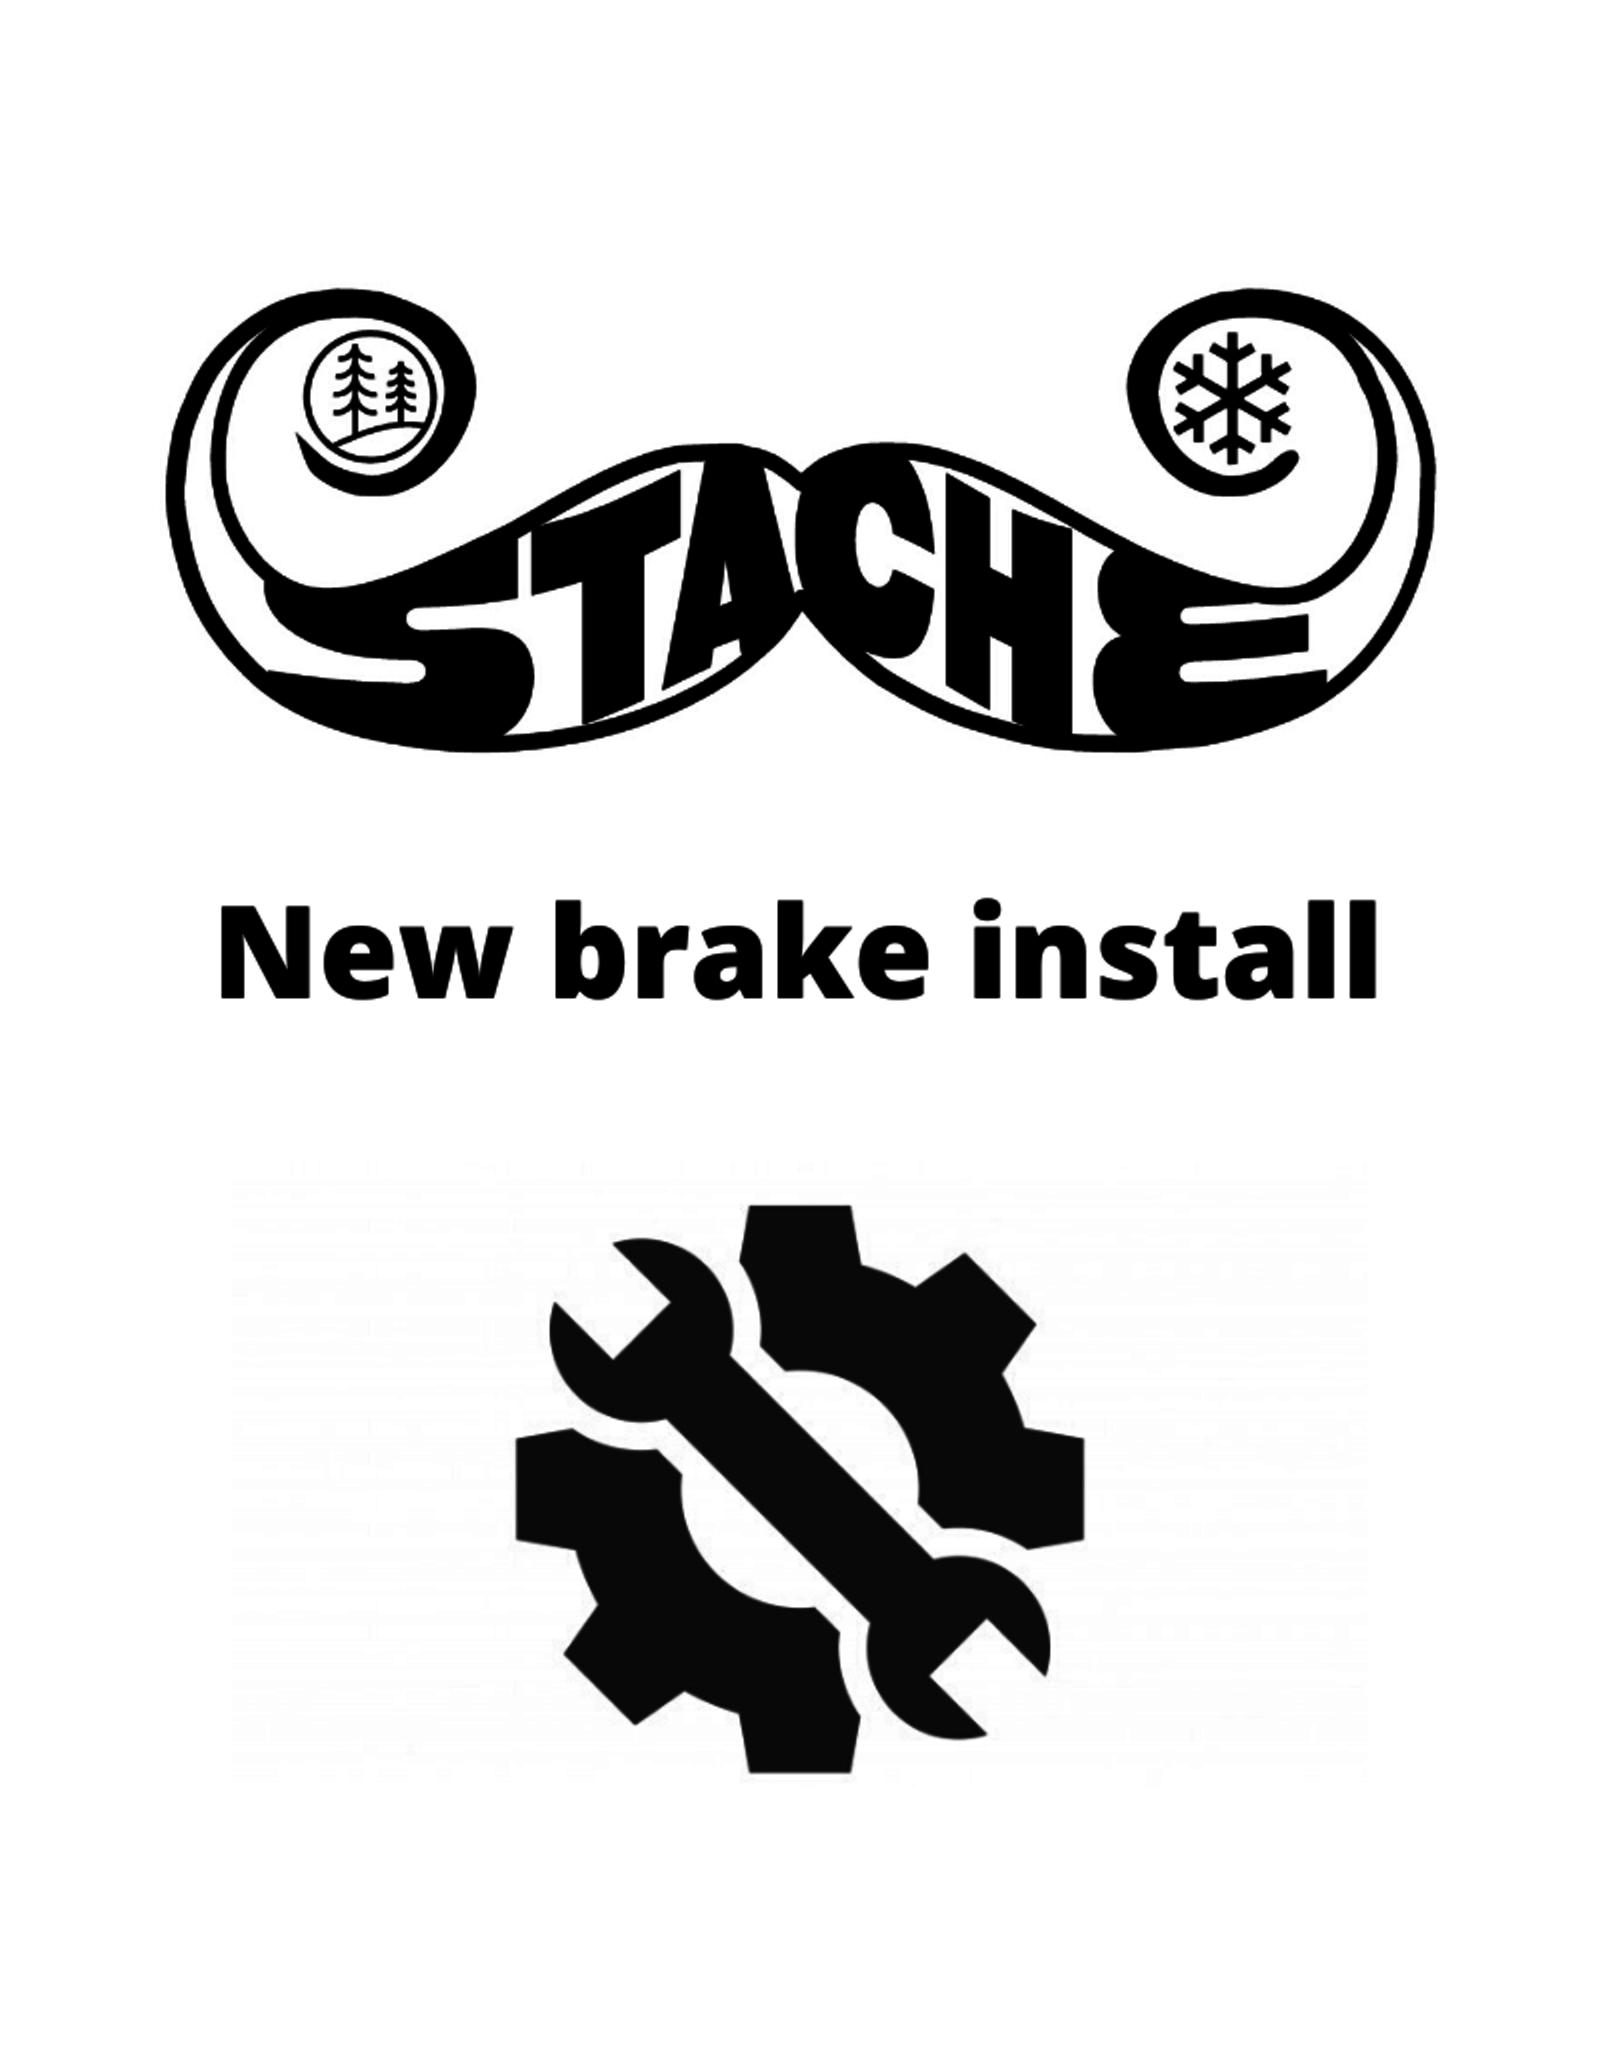 New brake install